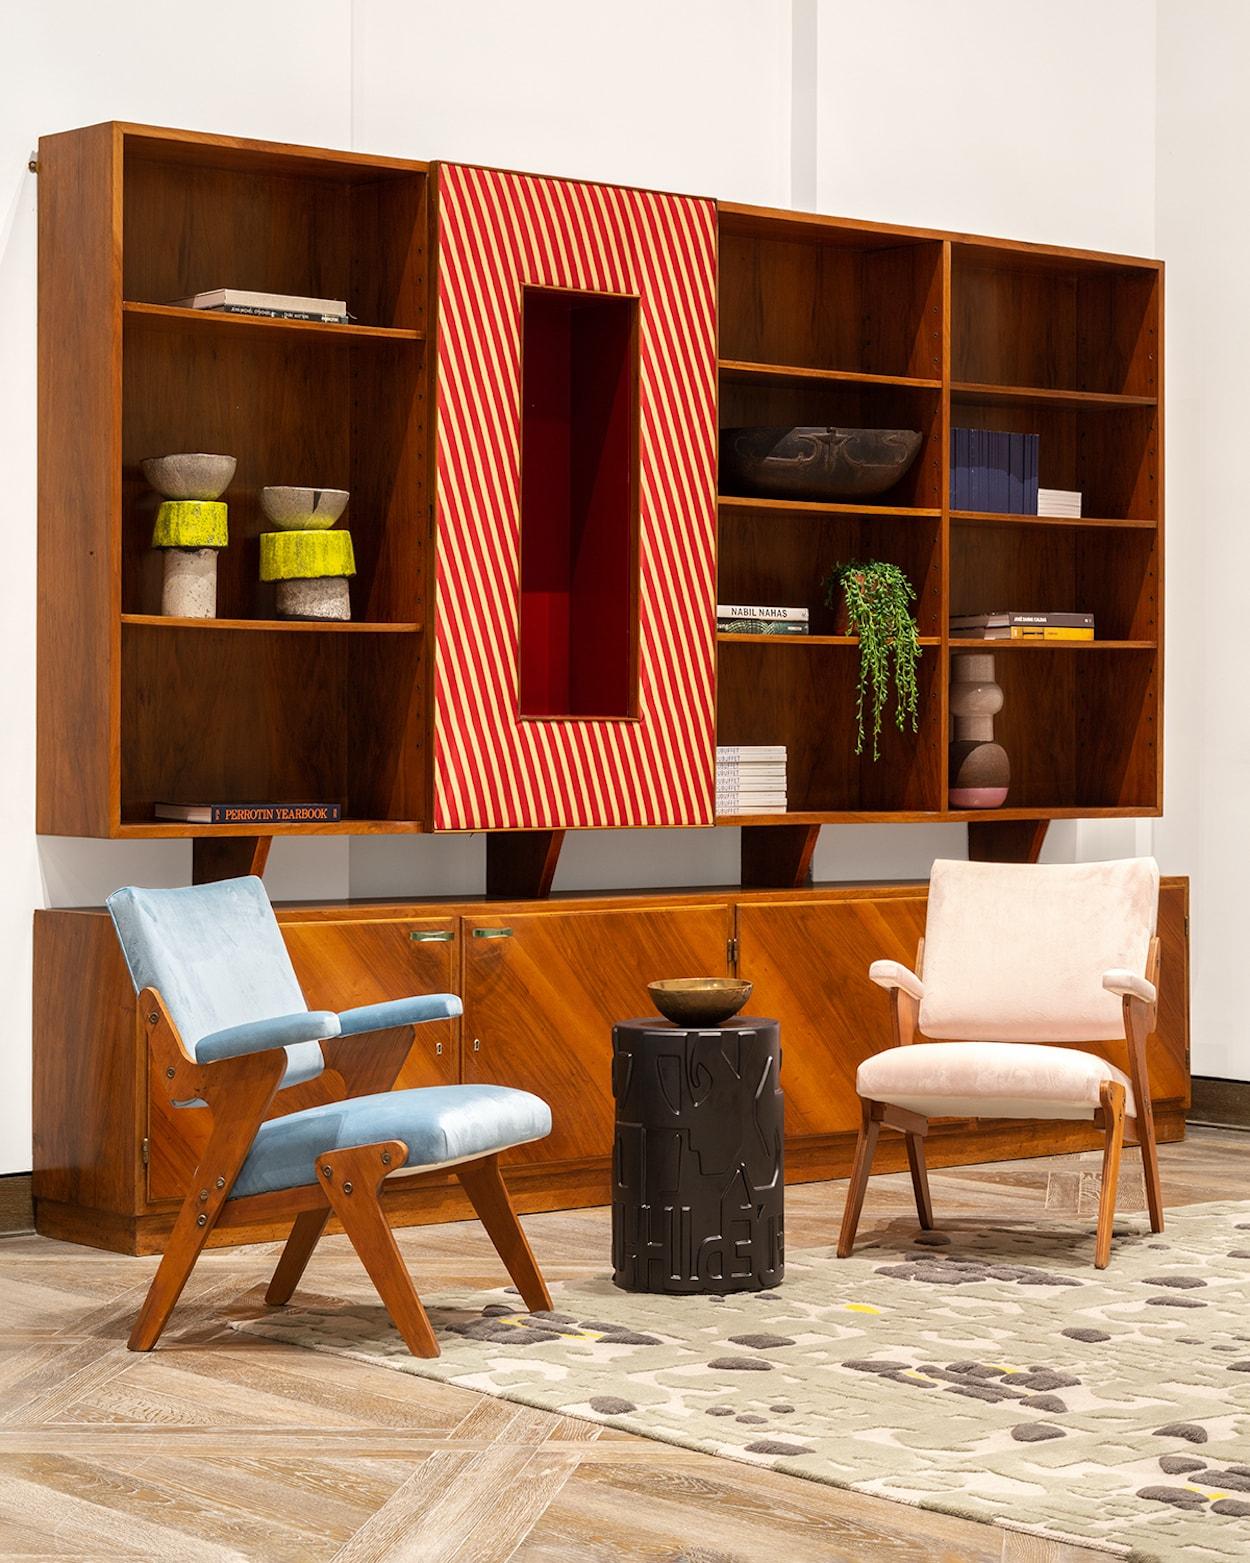 5_©_Robert_Granoff_111_W_57th_PH_20_Living_Room_Bookcase-min